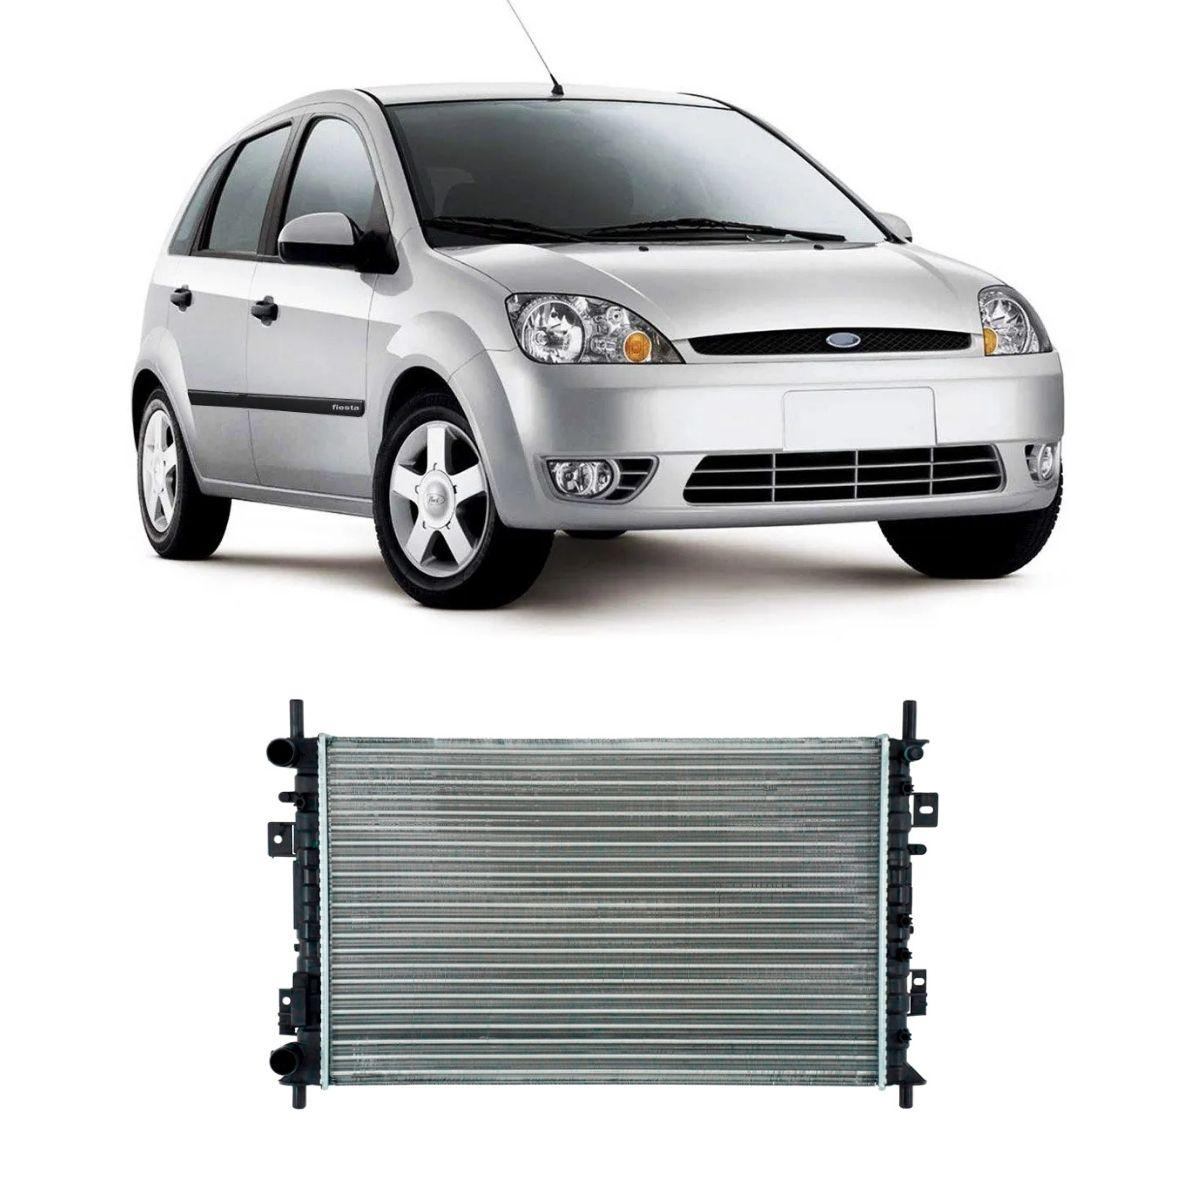 Radiador Fiesta 2003/2006 Ecosport 2003/2009 1.0 1.6